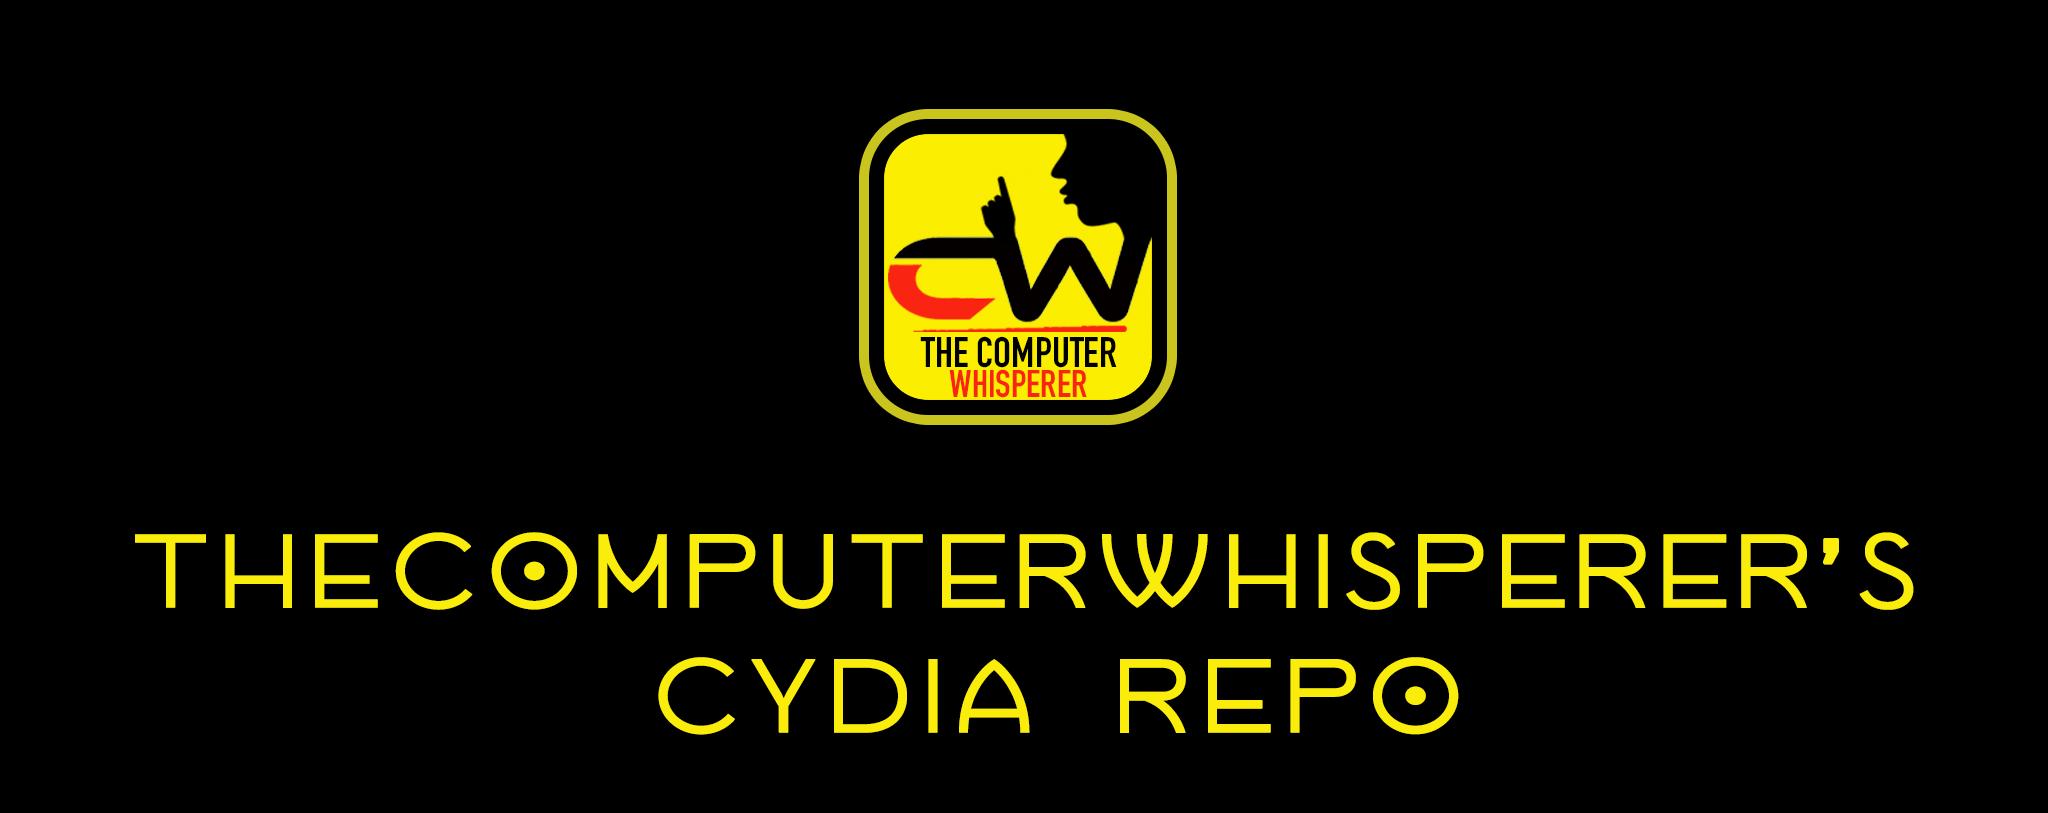 TheComputerWhisperer's Cydia Repo - banner image.